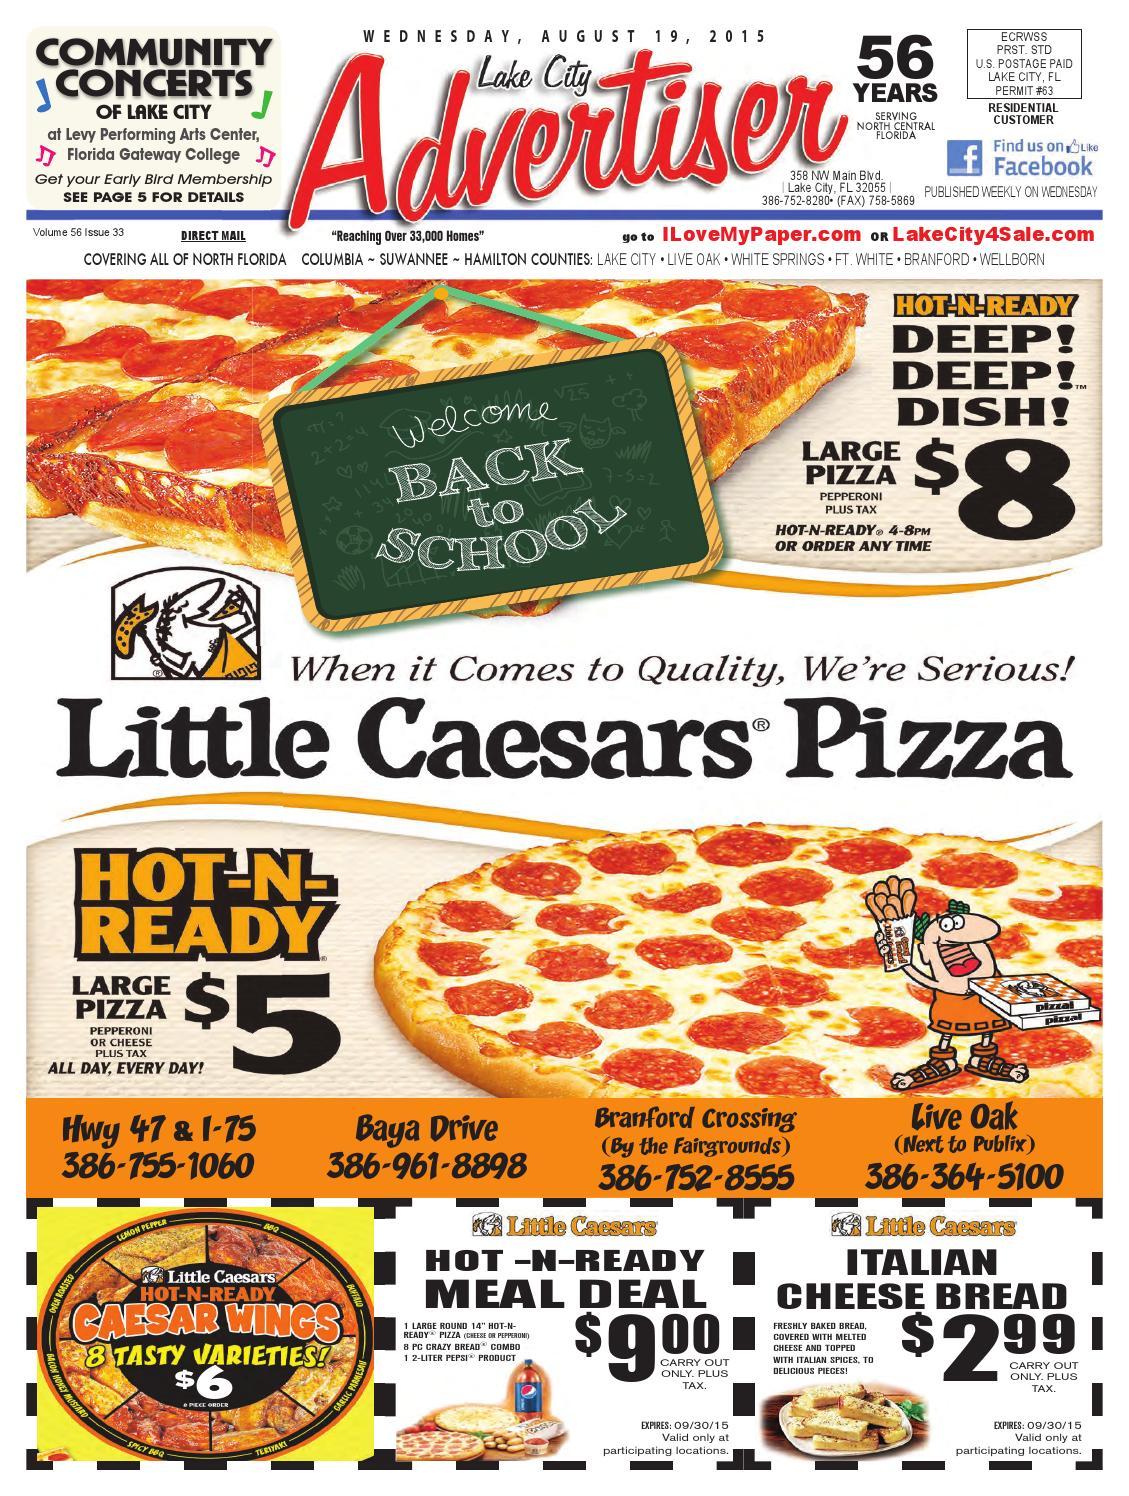 08 19 15_Advertiser by North Central Florida Advertiser issuu